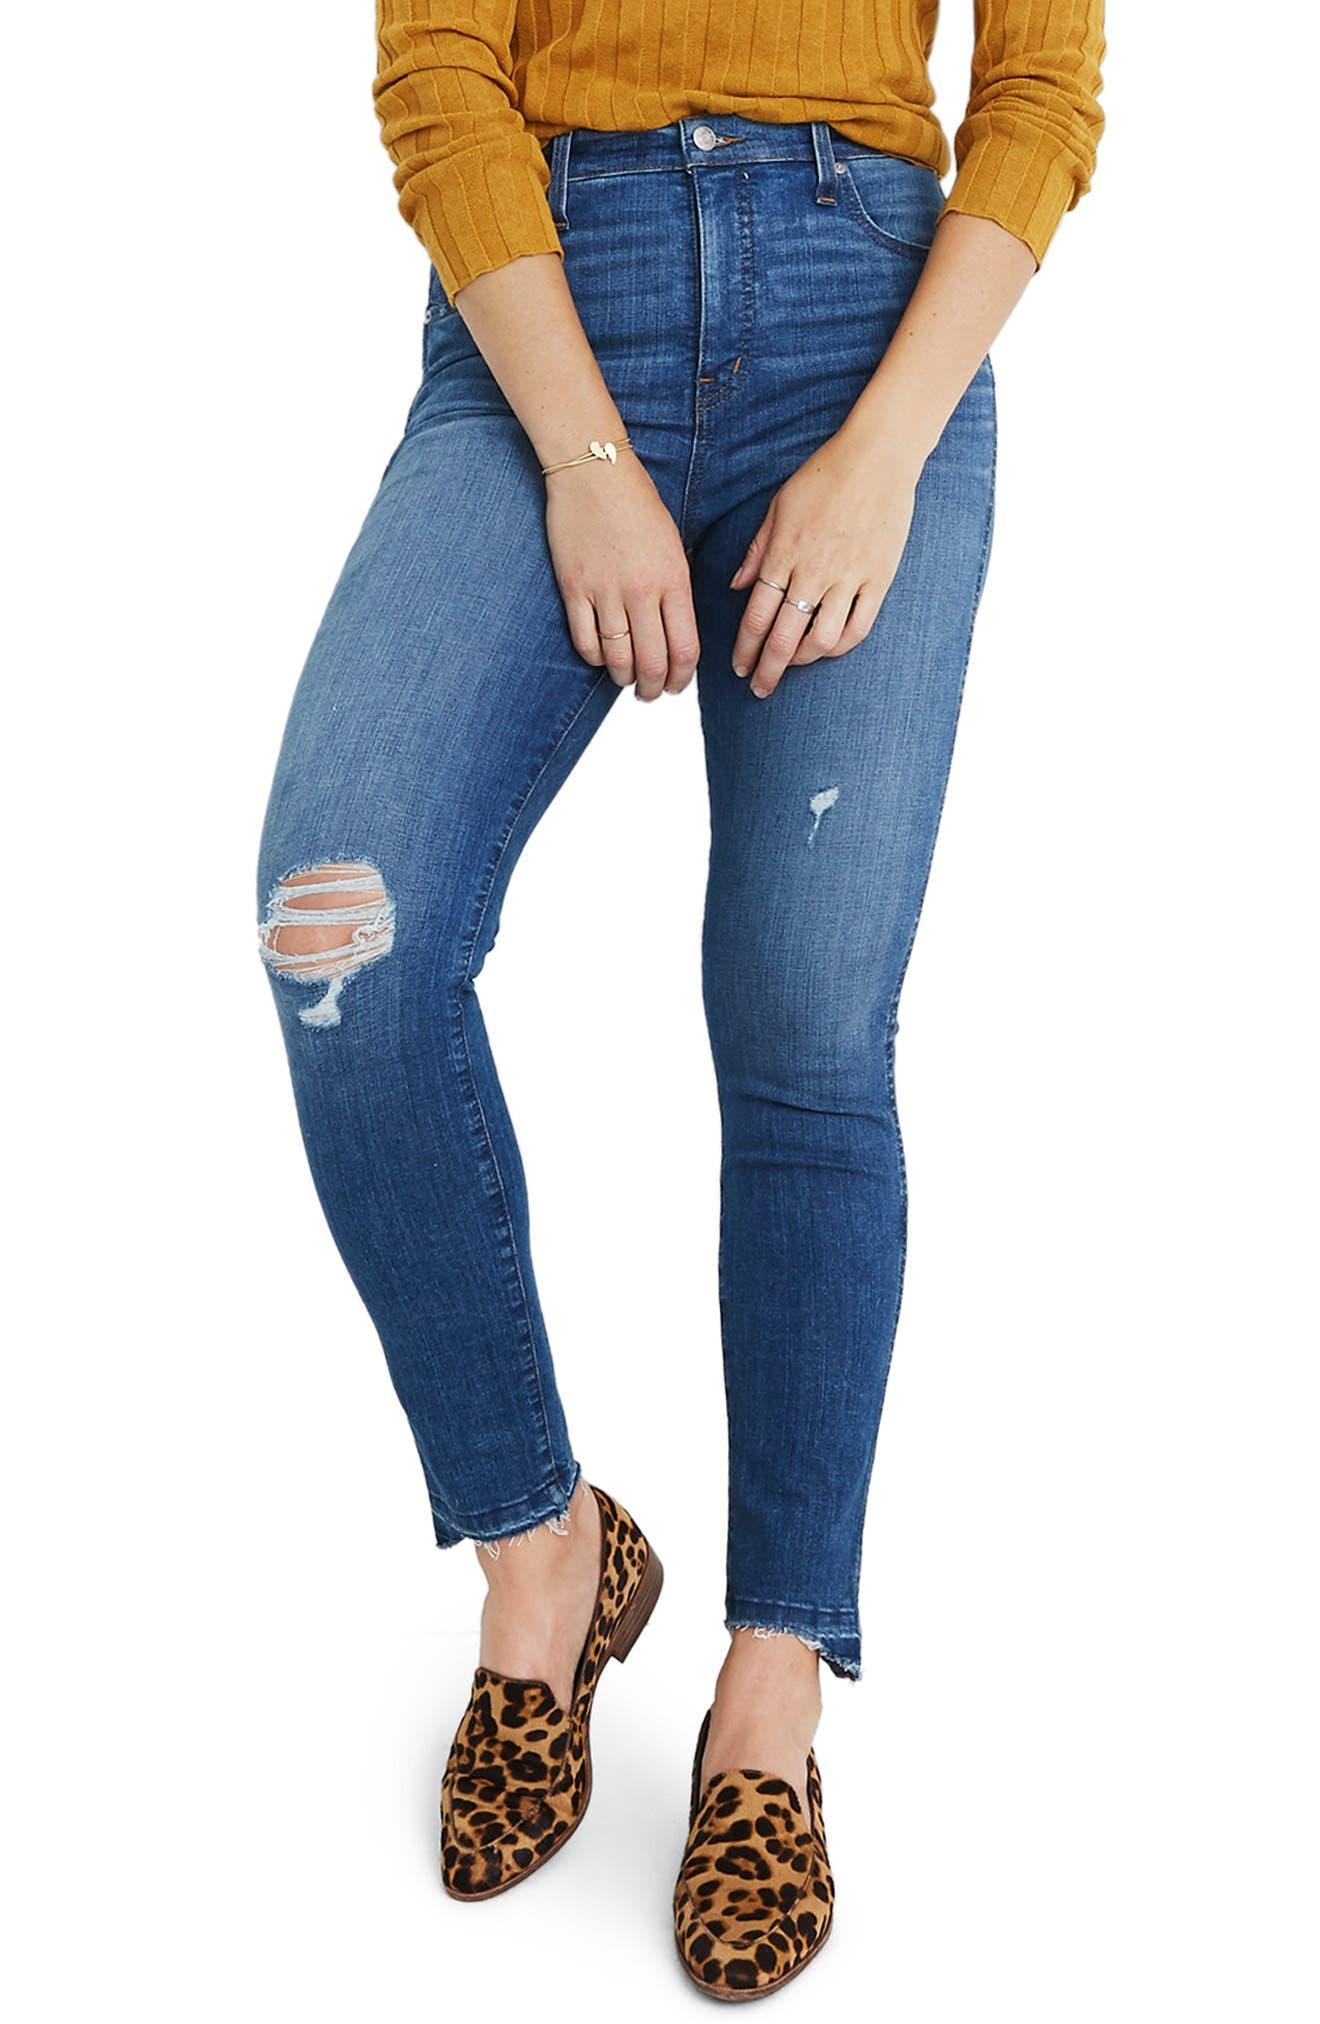 10 Inch Drop Step Hem High Waist Skinny Jeans by Madewell